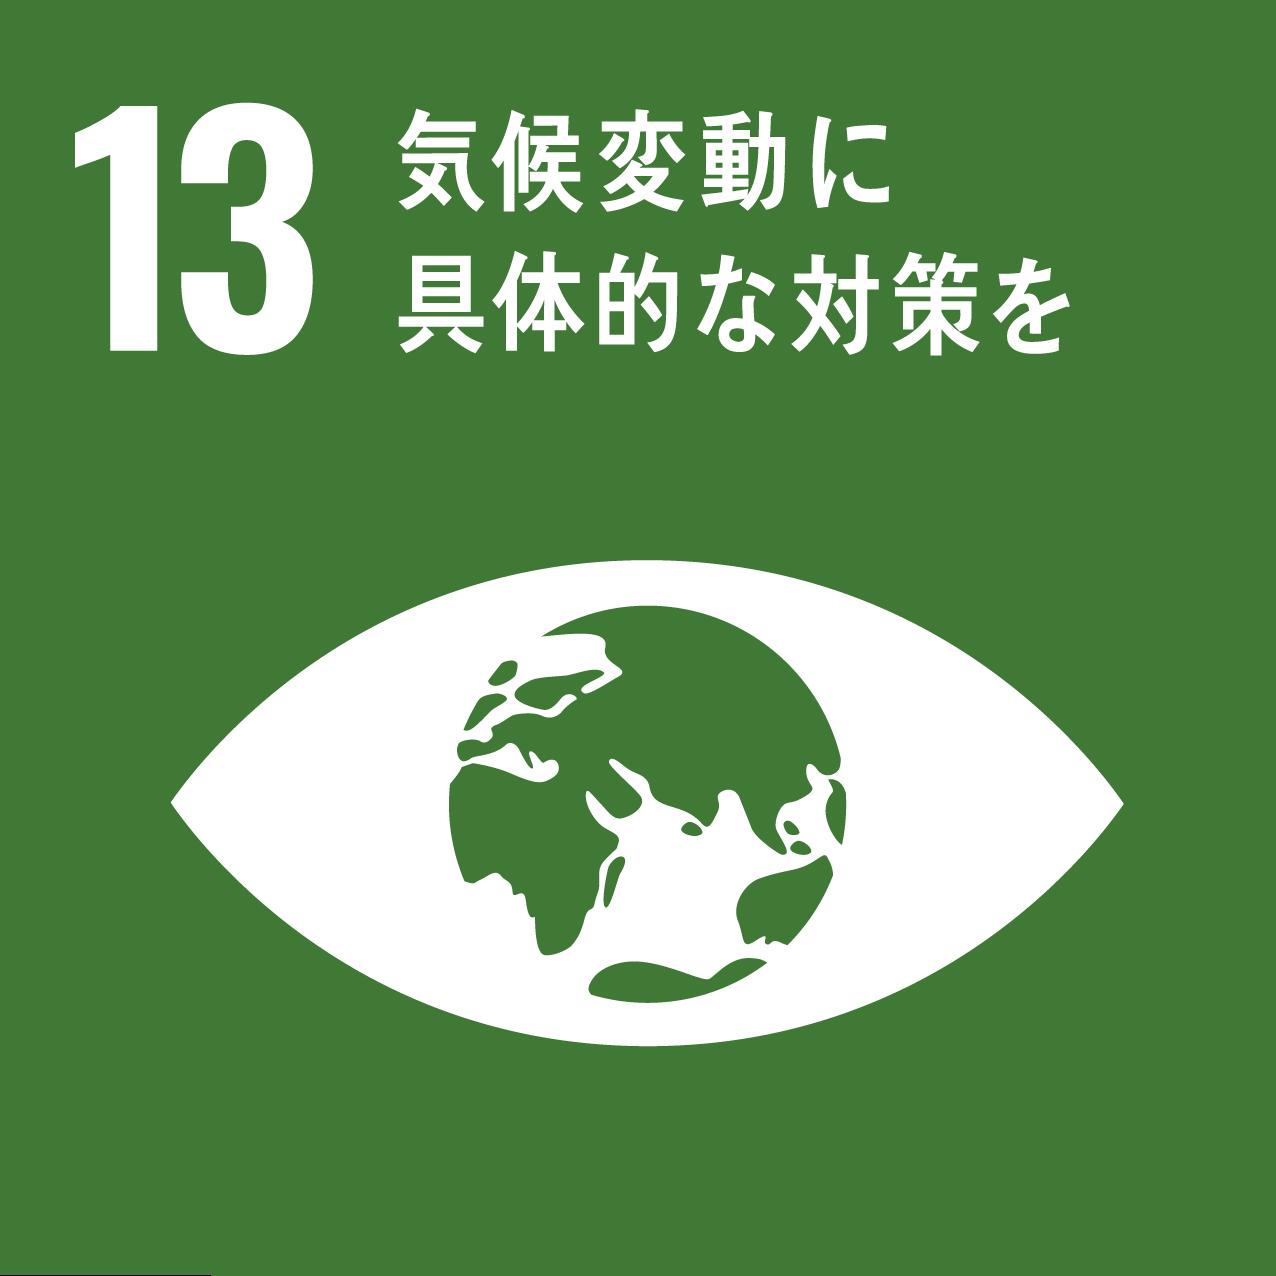 Goal13 気候変動に具体的な対策を